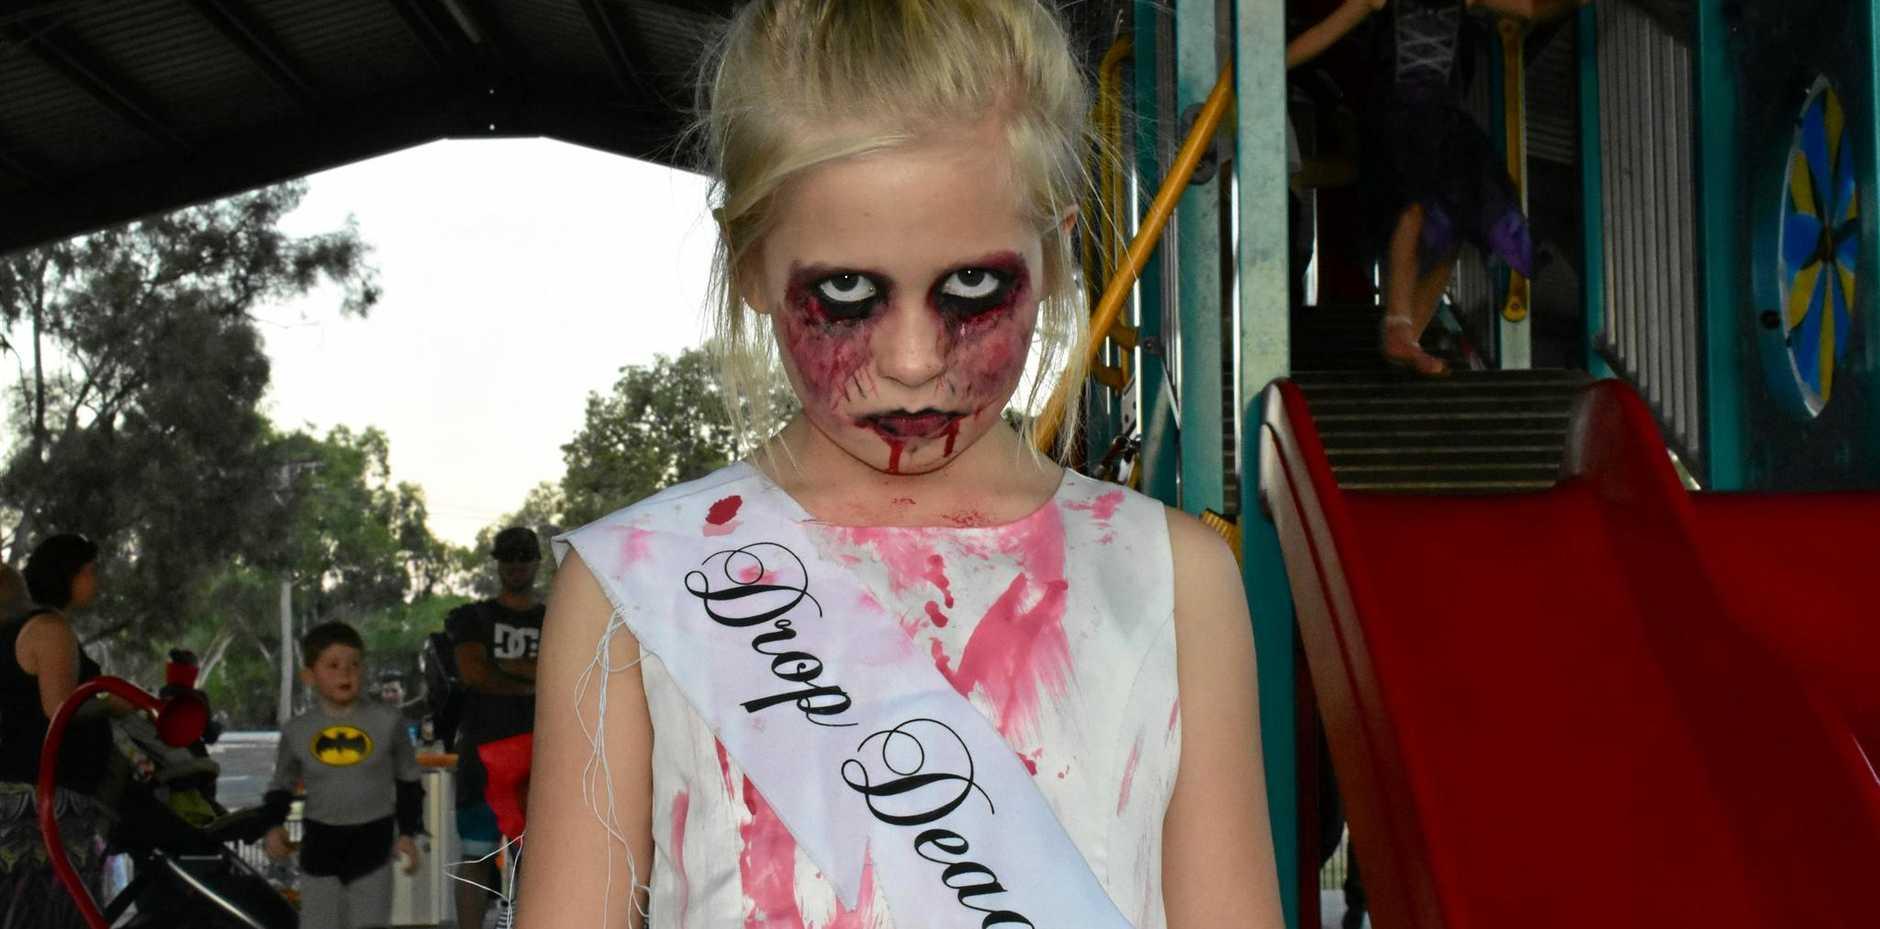 Haylee Proud as a zombie princess